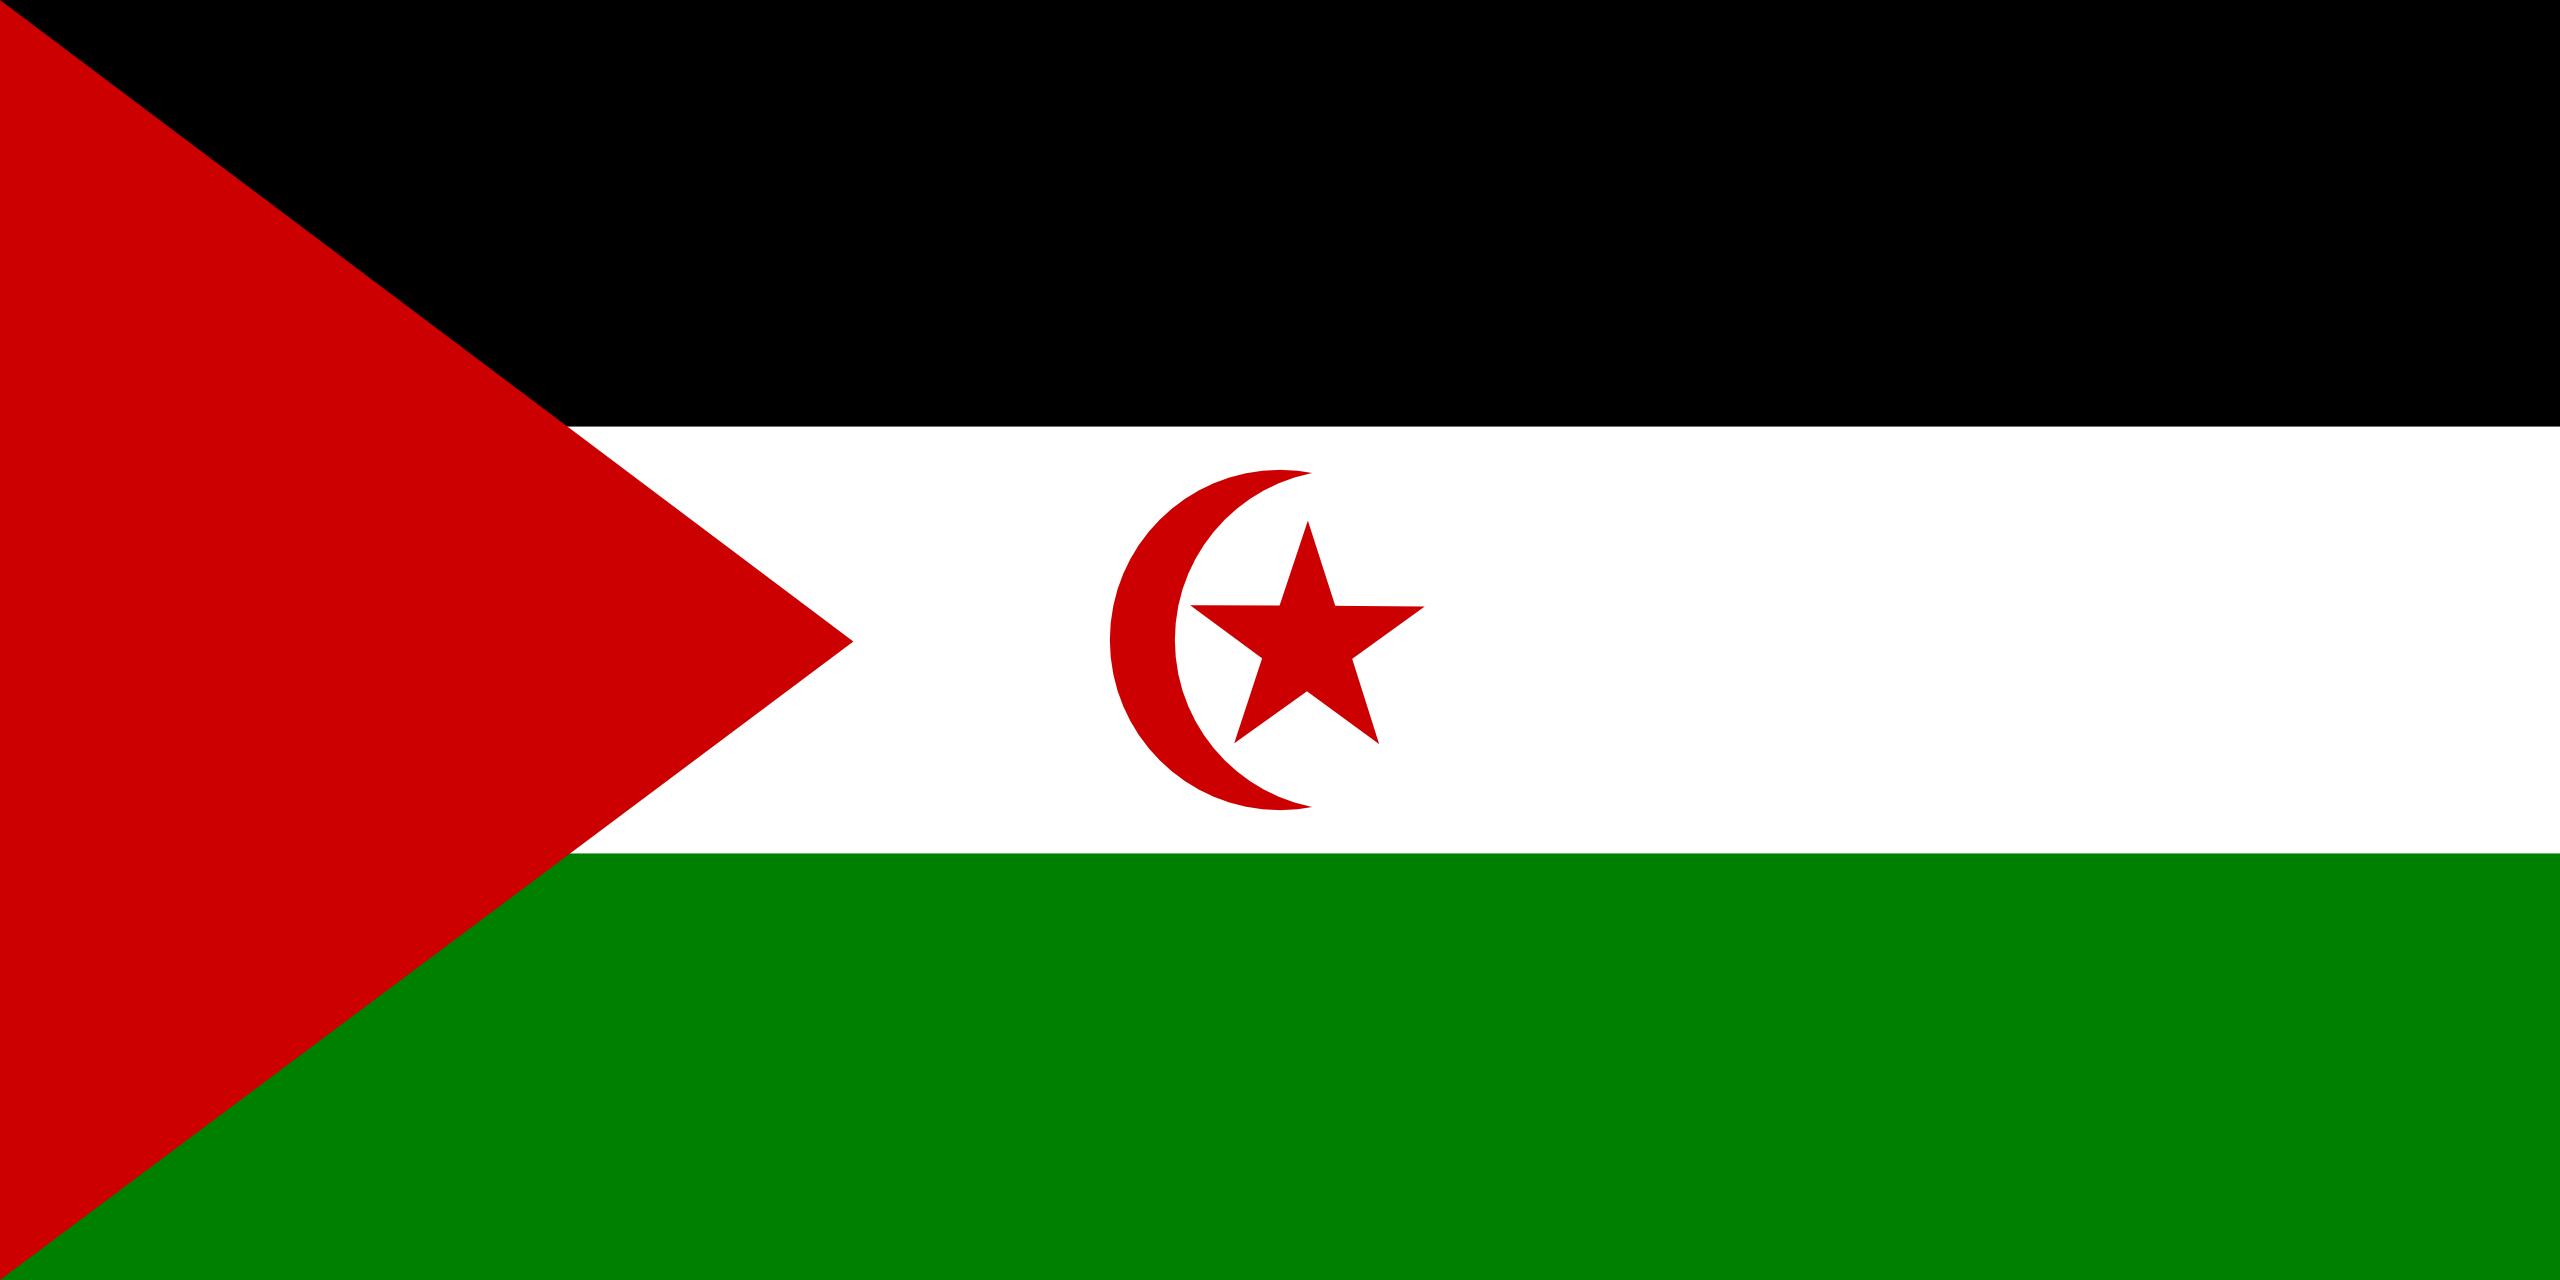 sahara occidental, país, emblema, insignia, símbolo - Fondos de Pantalla HD - professor-falken.com